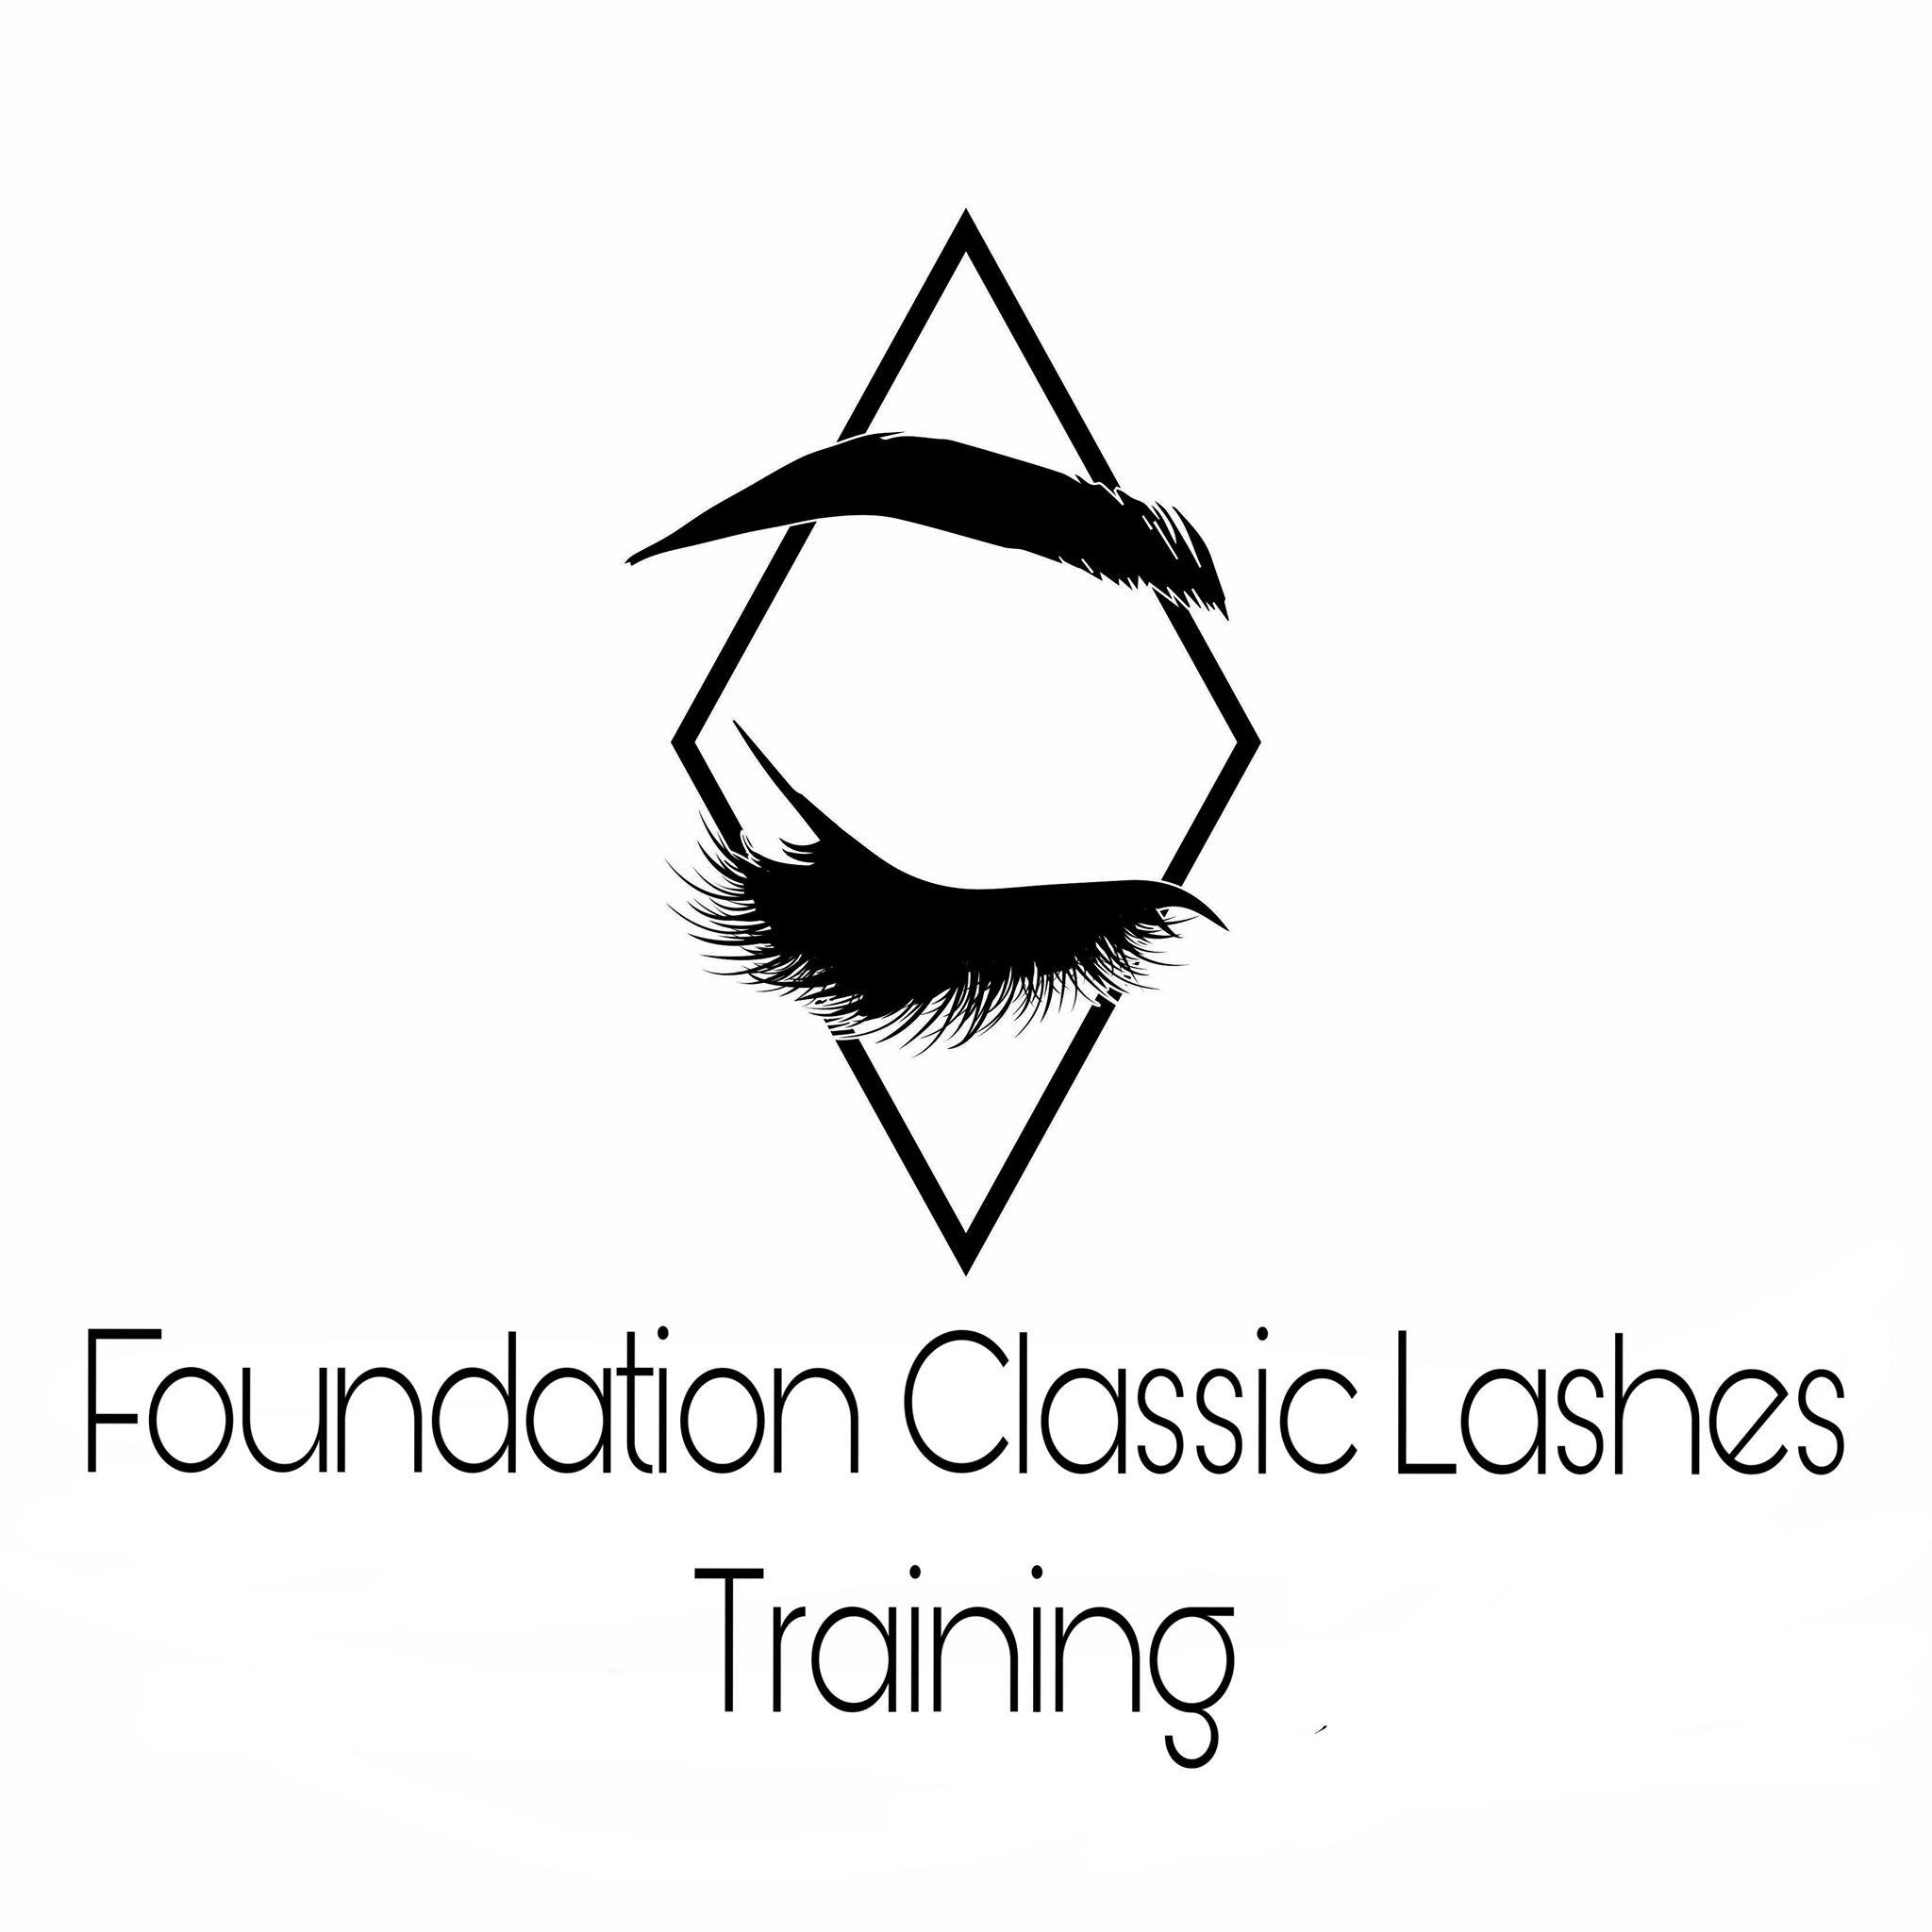 FOUNDATION CLASSIC LASH TRAINING